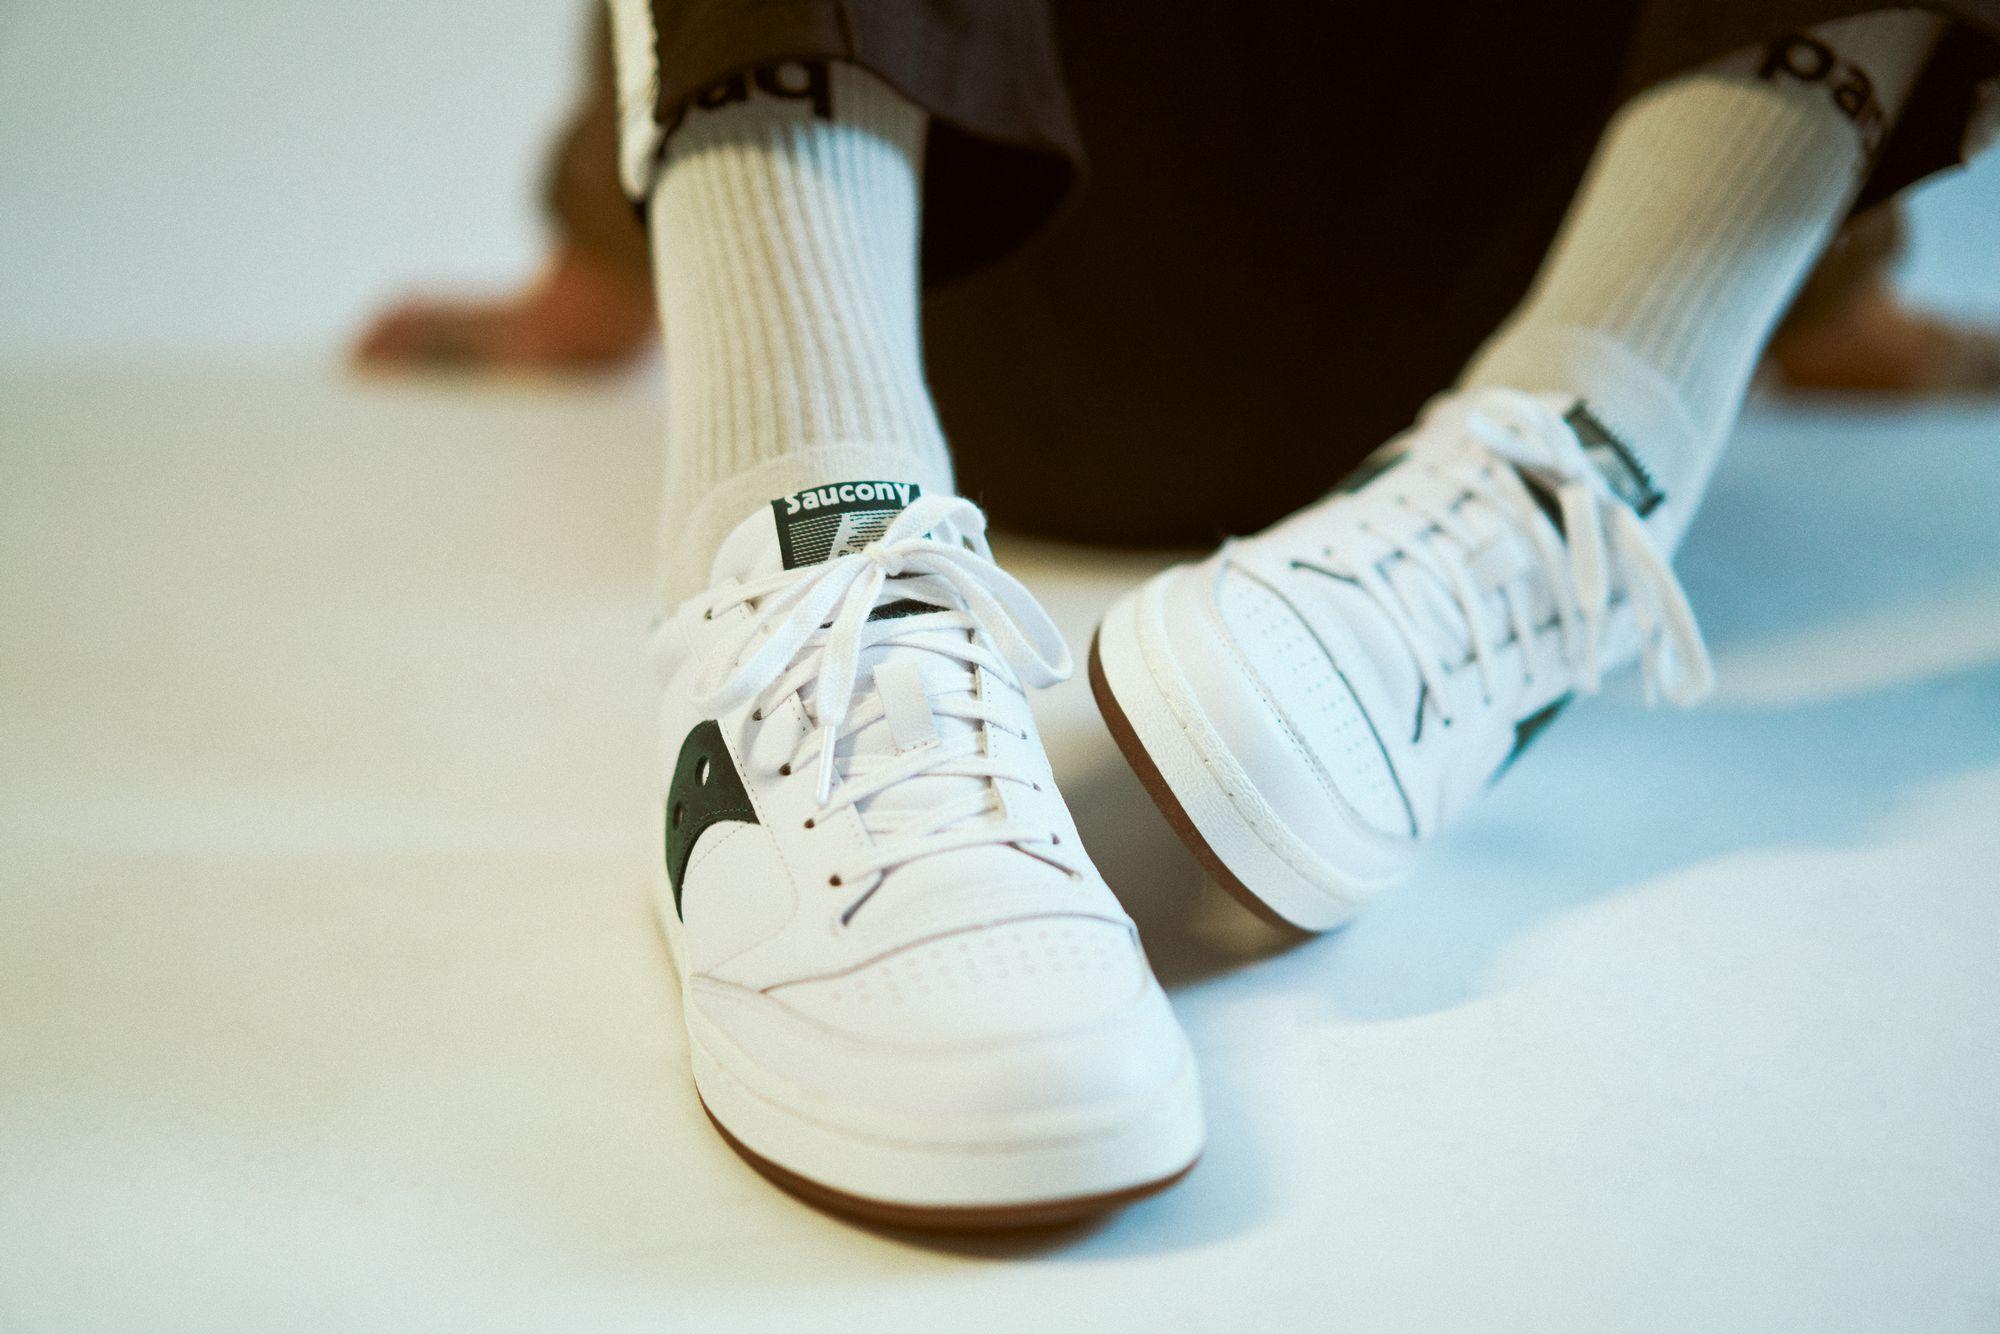 Saucony Jazz Court - white/green - S70555-8 - on feet